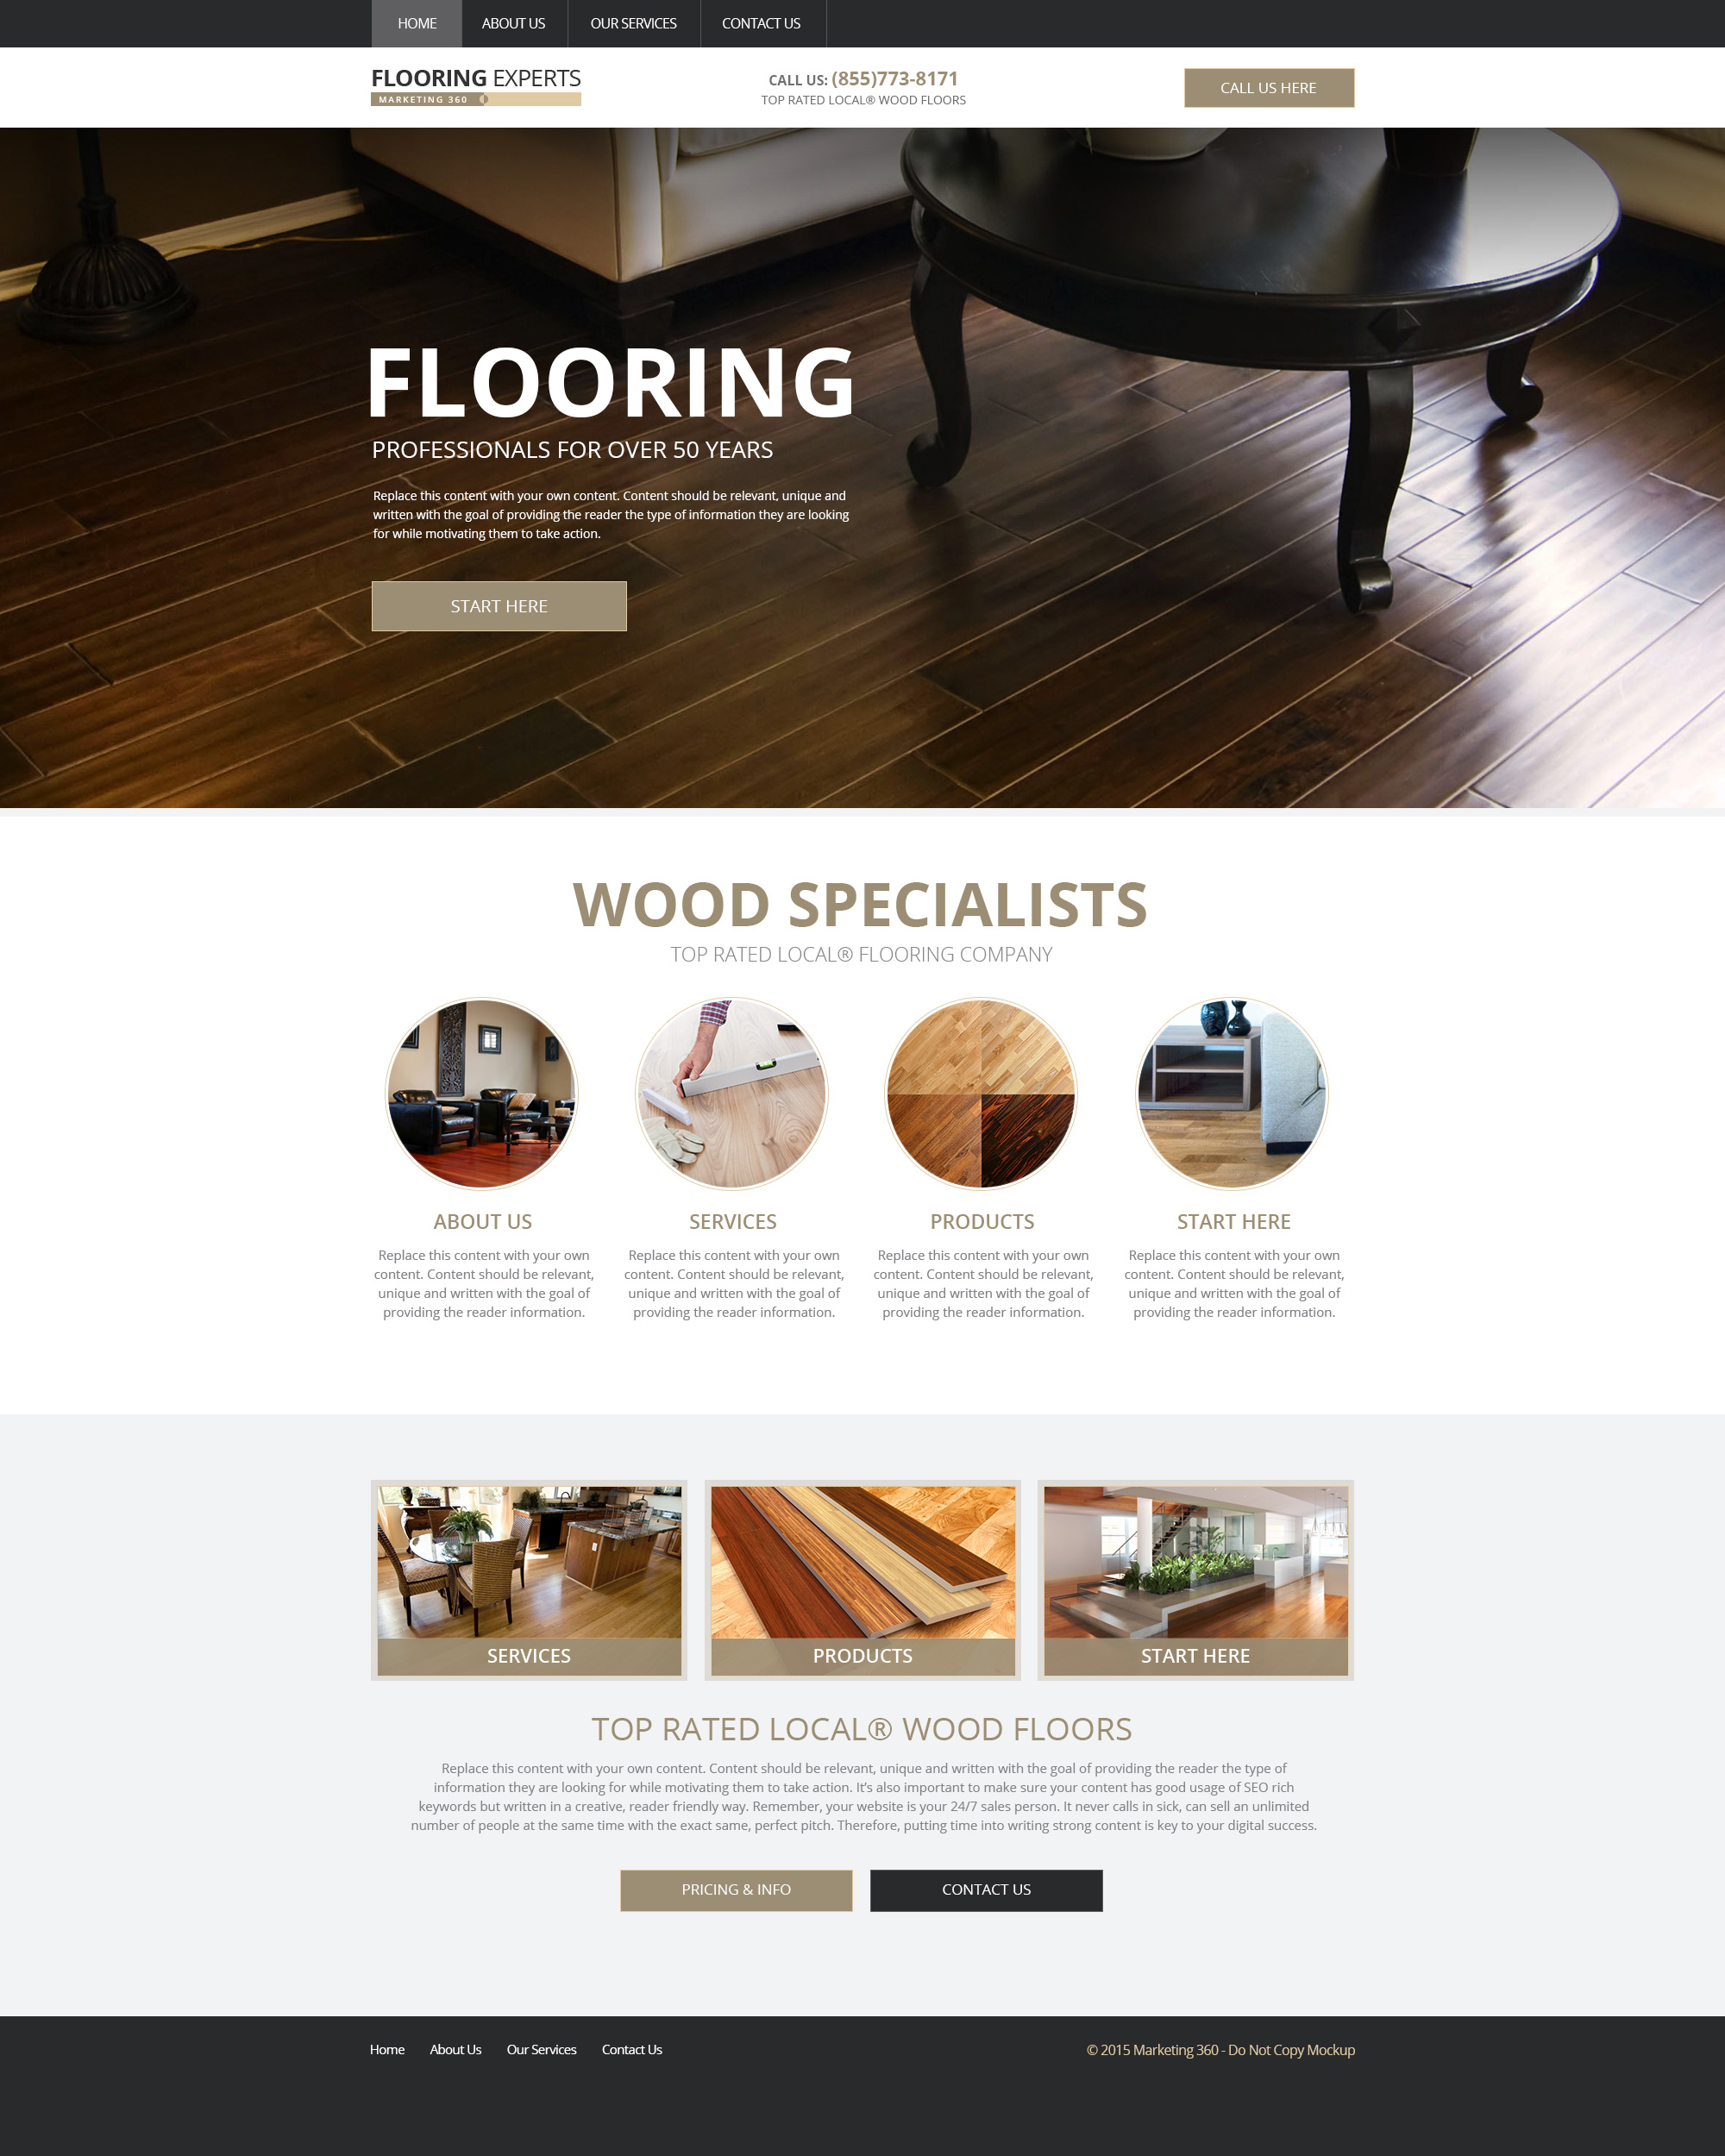 flooring website designs mobile responsive templates On flooring websites